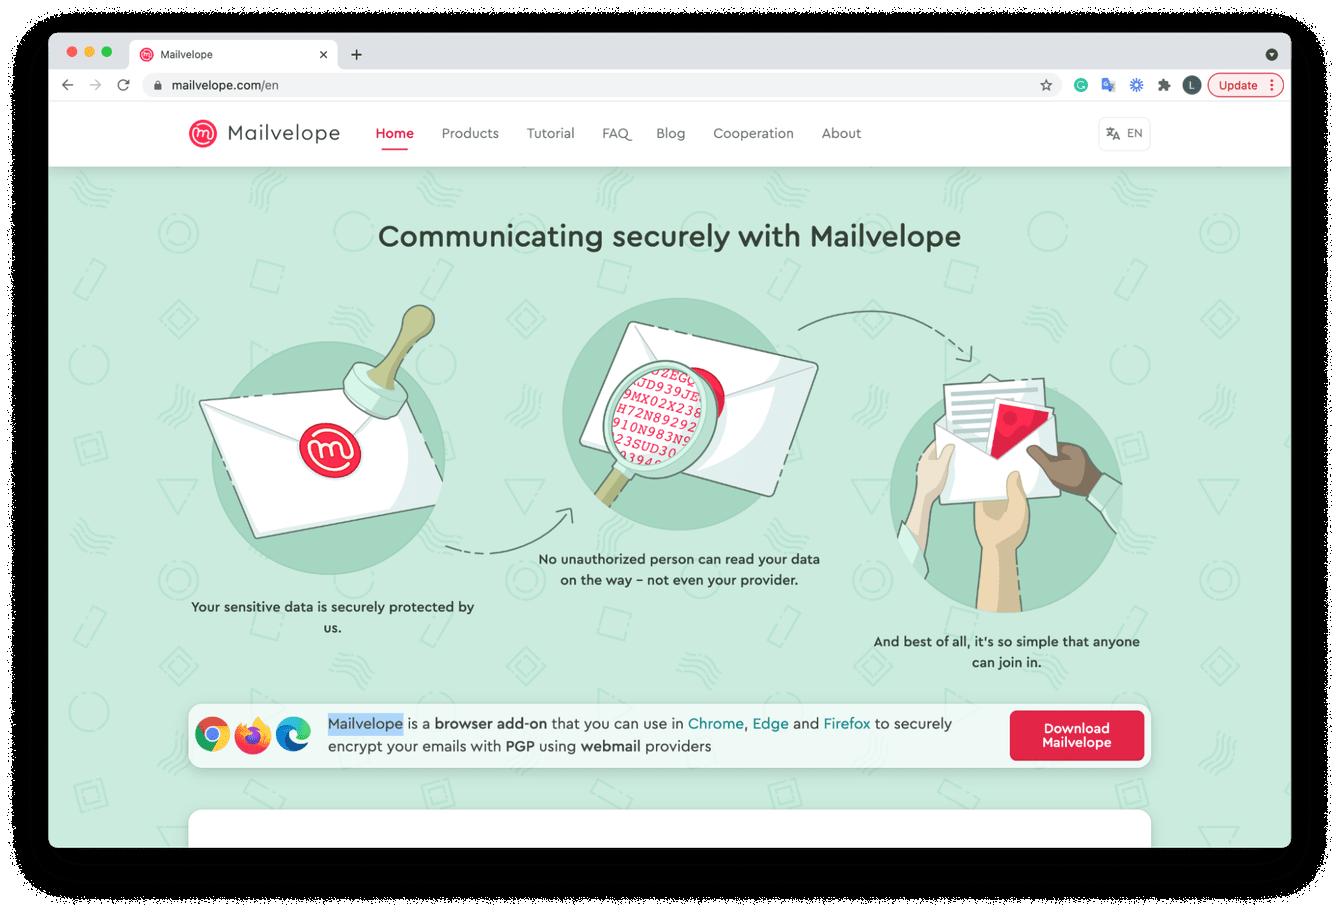 Mailvelope website screenshot